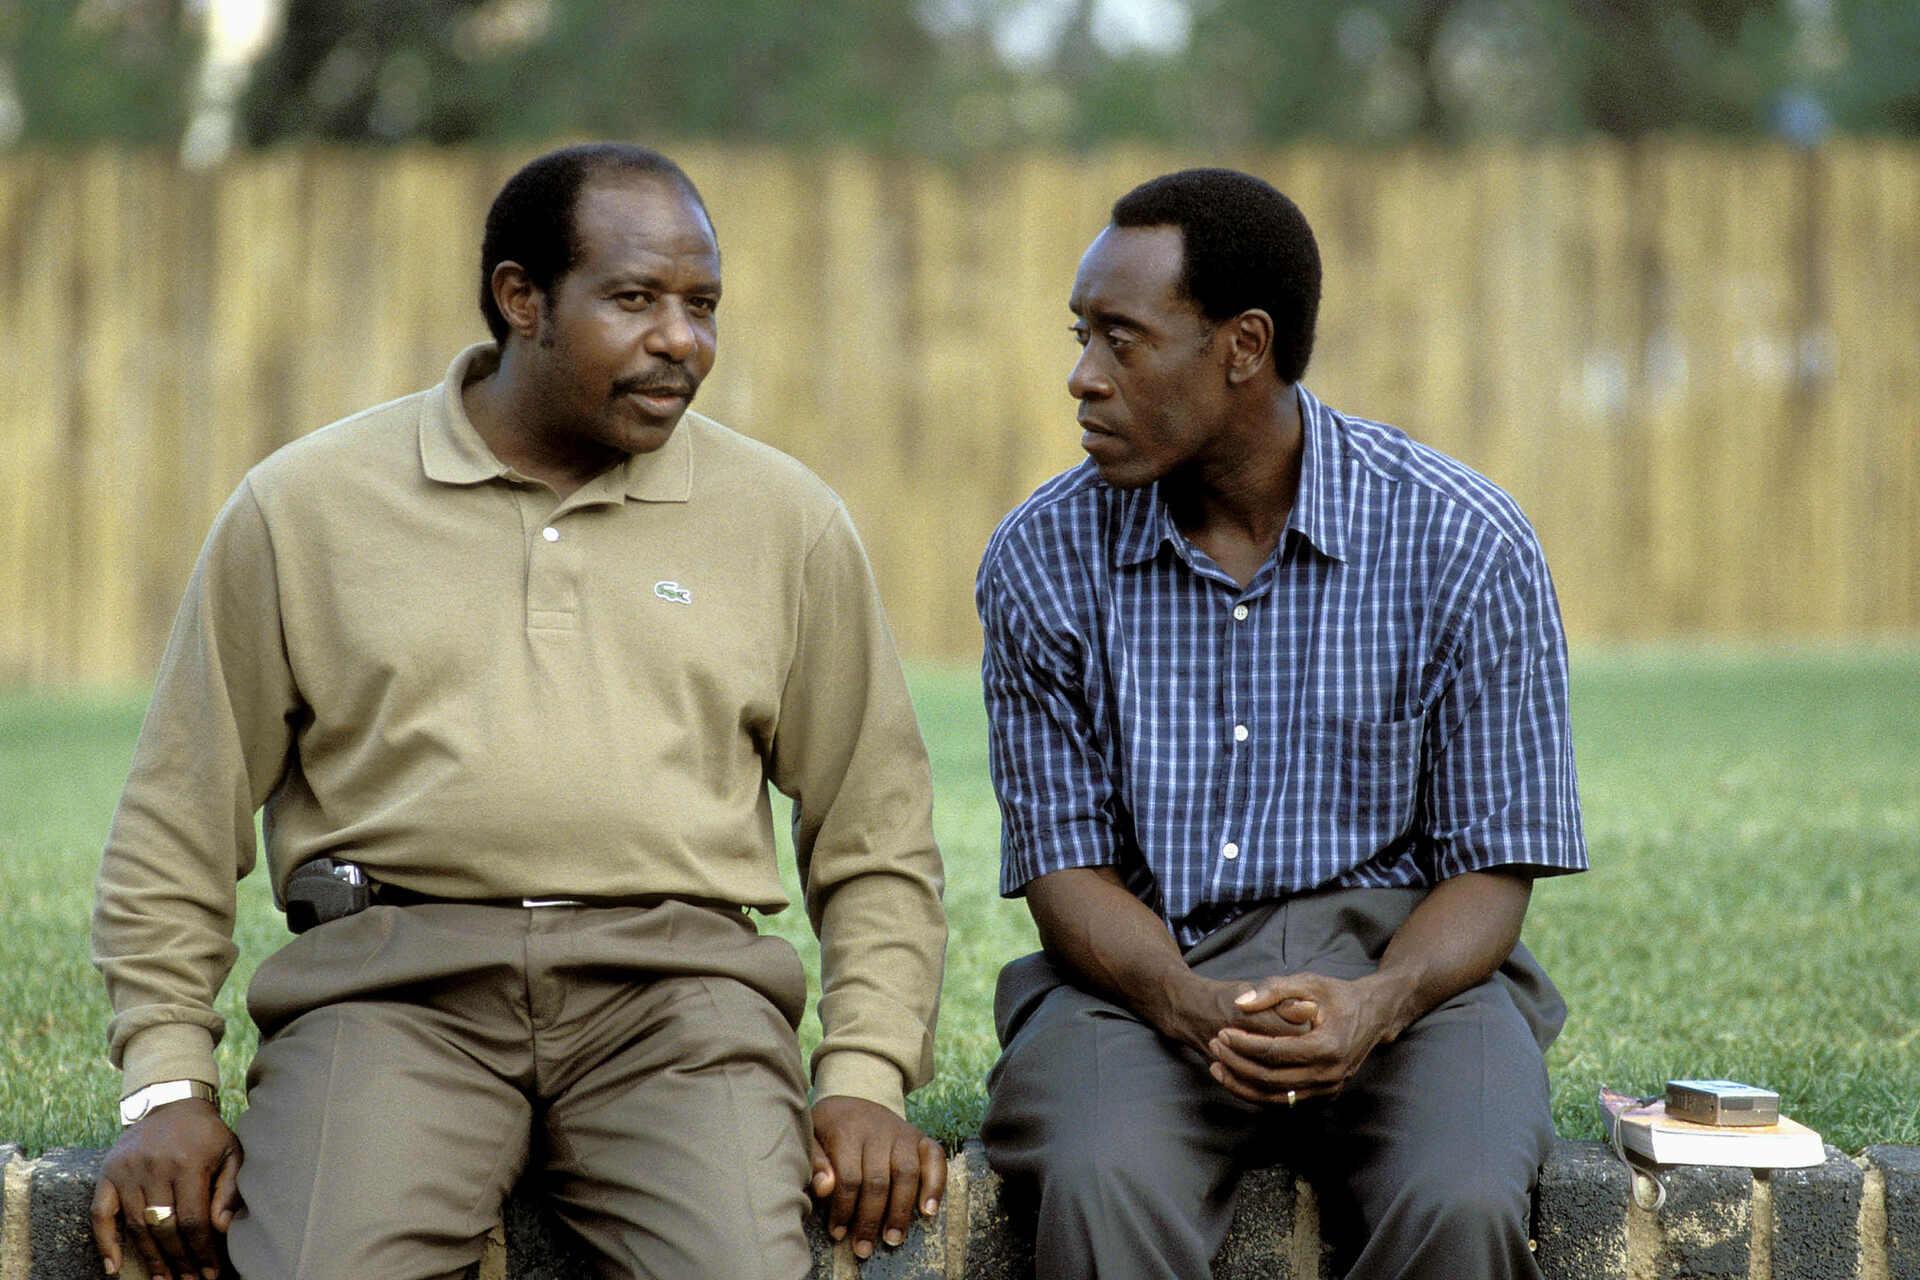 Paul Rusesabagina and Don Cheadle on the set of Hotel Rwanda. [PHOTO CREDIT: AF Archive/Alamy Stock Photo]